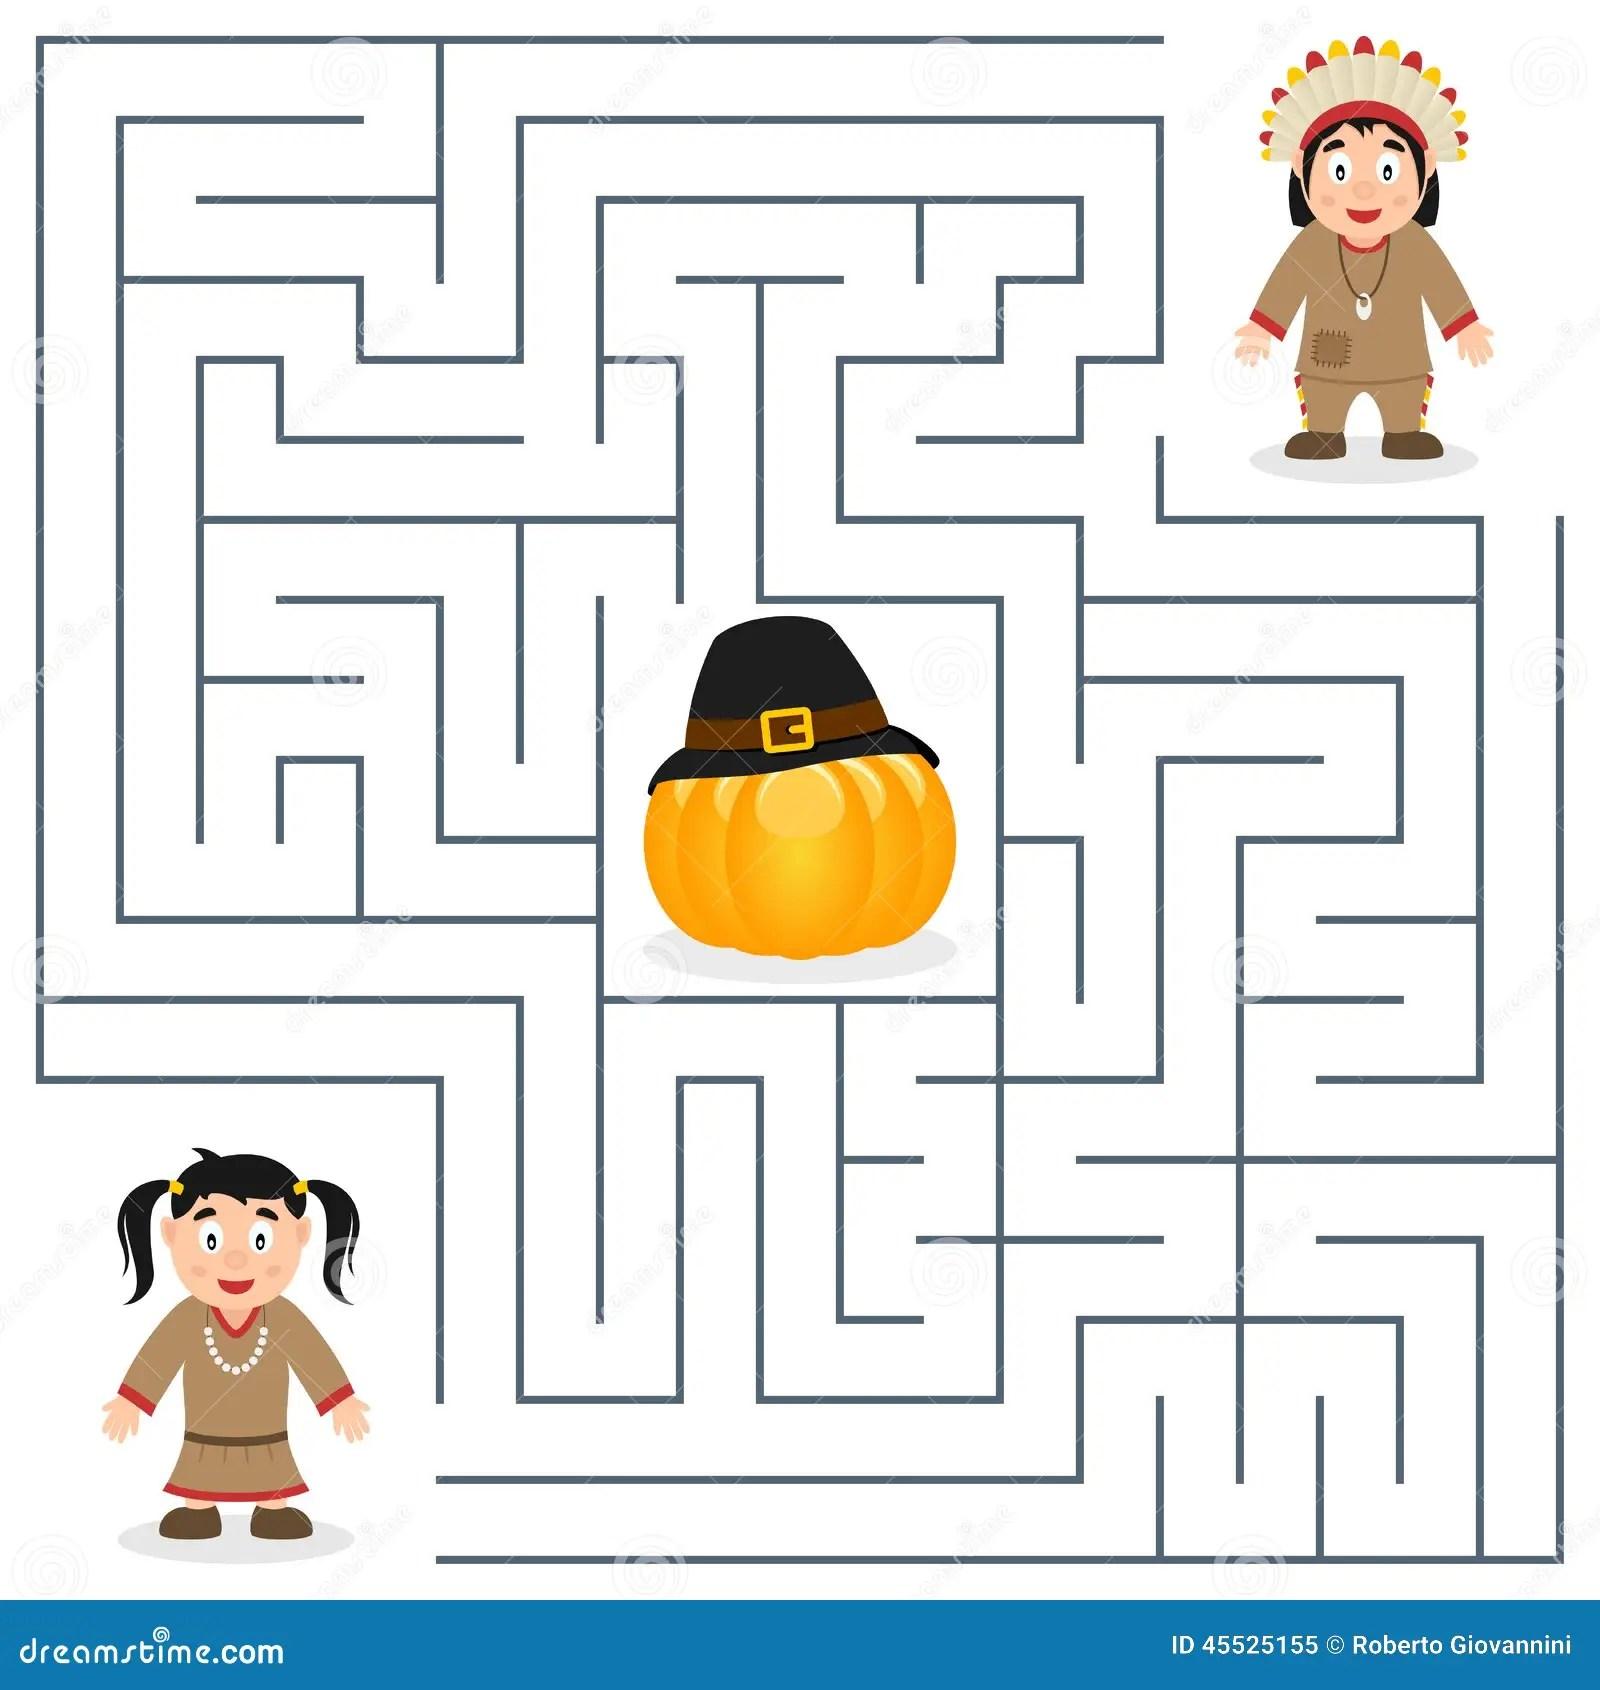 Thanksgiving Maze For Kids